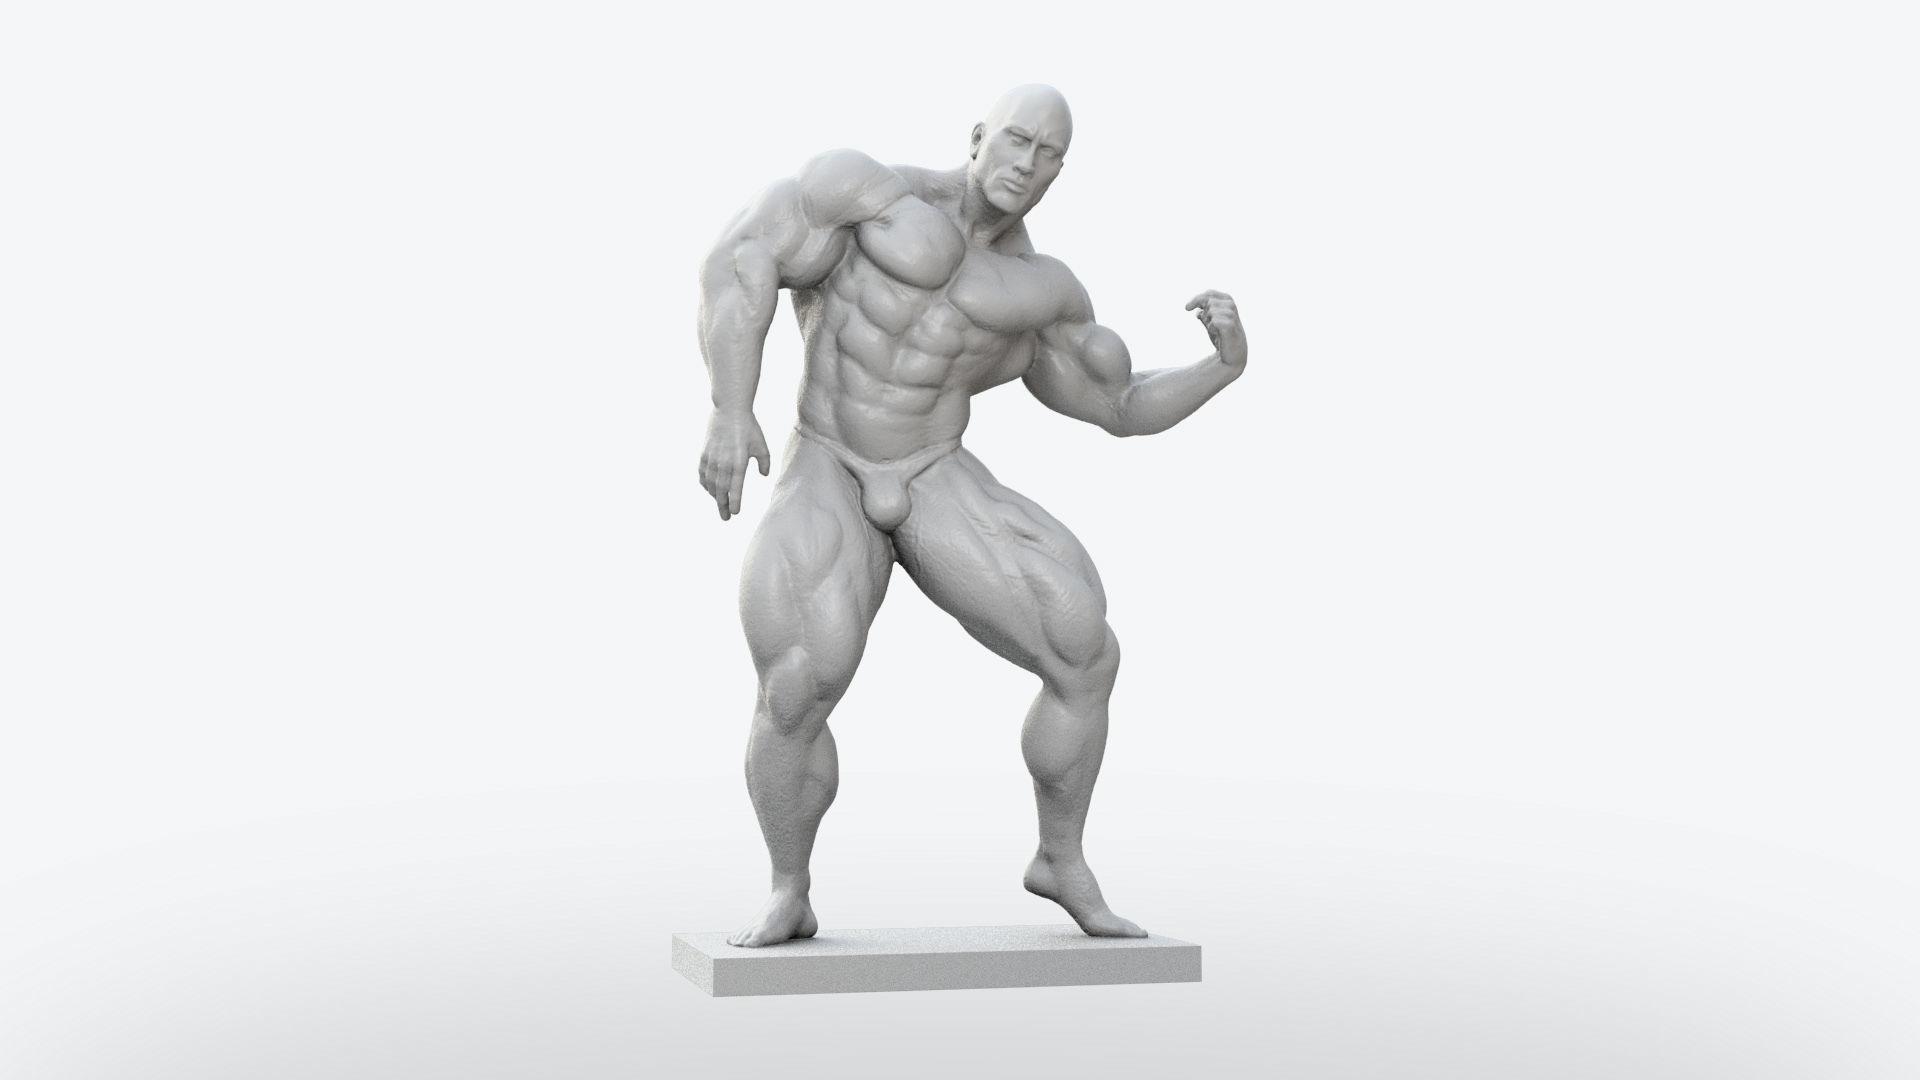 Body Builder Statue